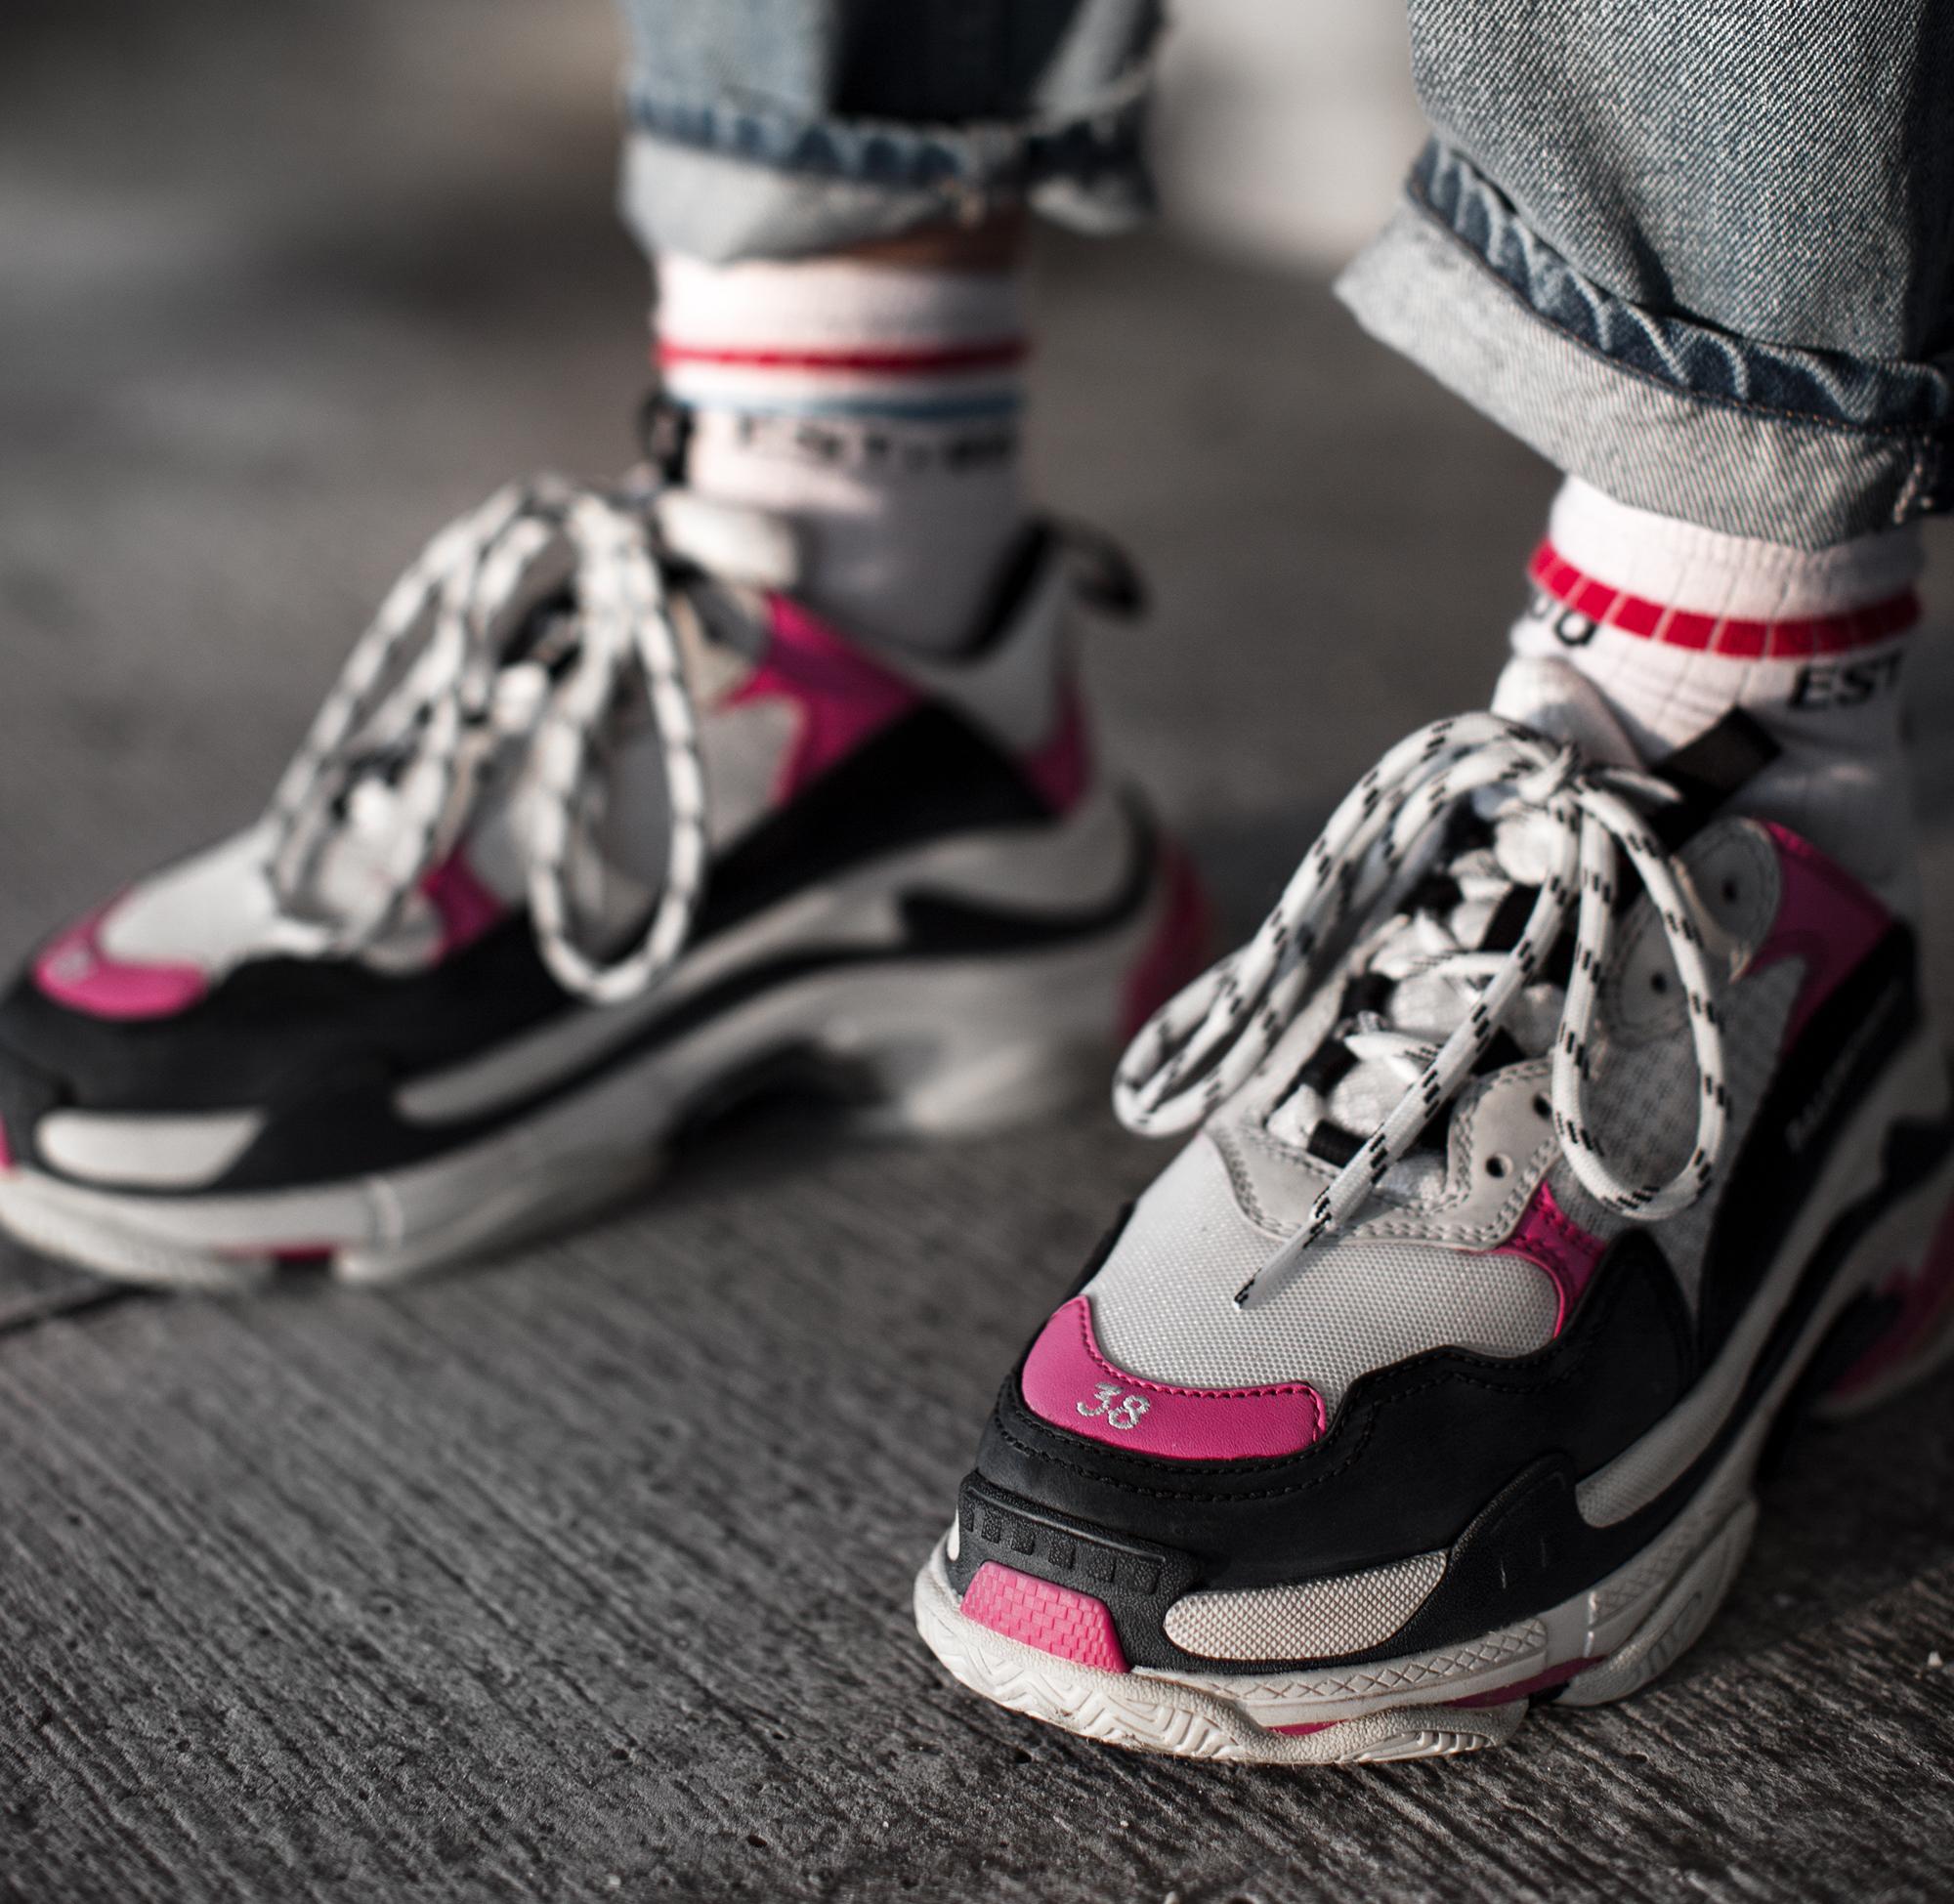 black-palms-balenciaga-triple-s-sneaker-pink-streetstyle-denim-fashionblog.jpg